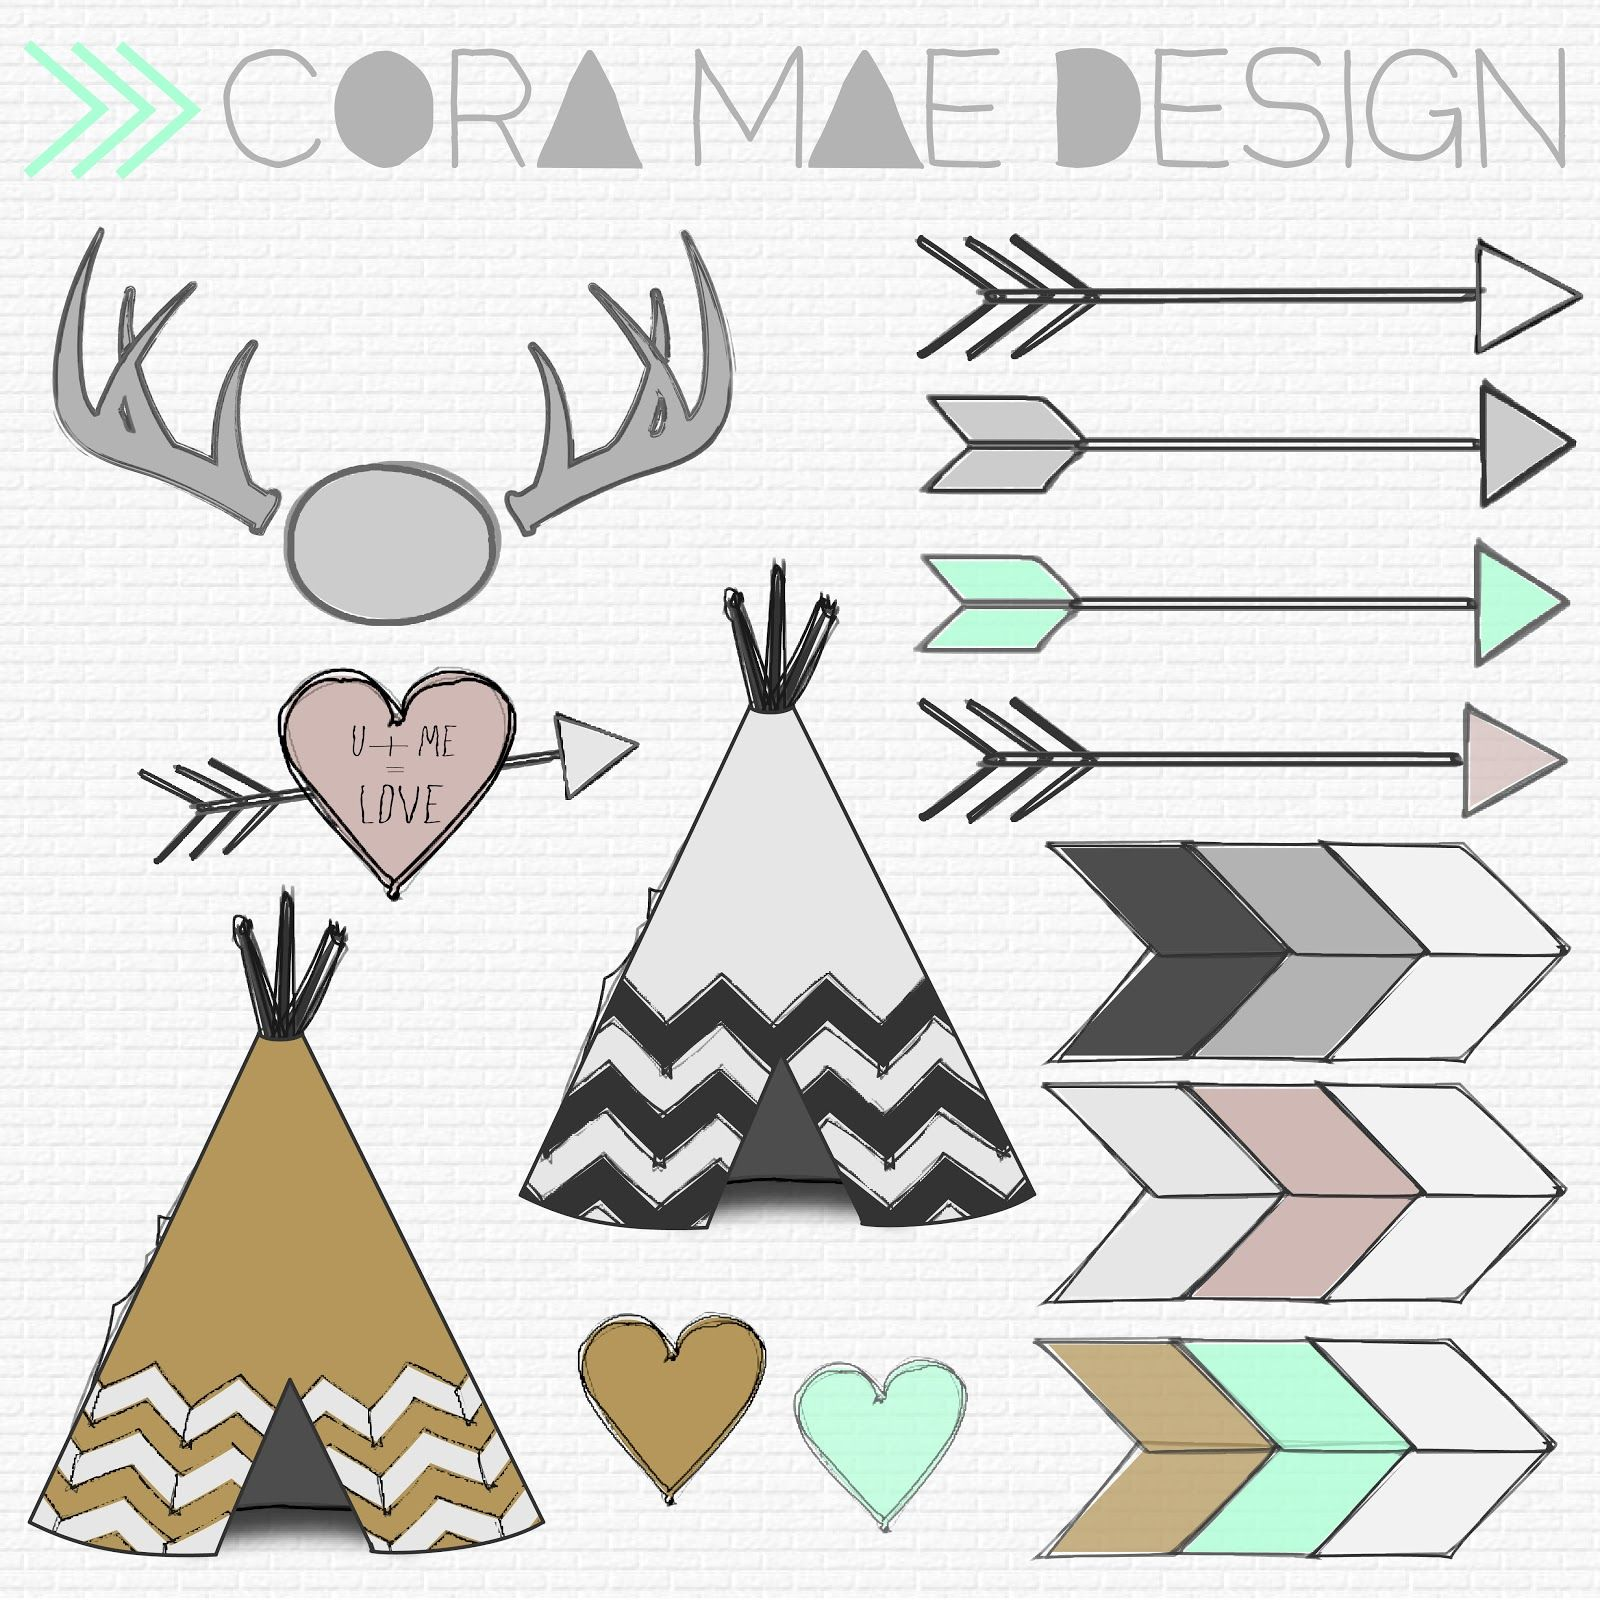 Cora Mae Design Free Teepee Antler Arrow Clipart Tribal Print